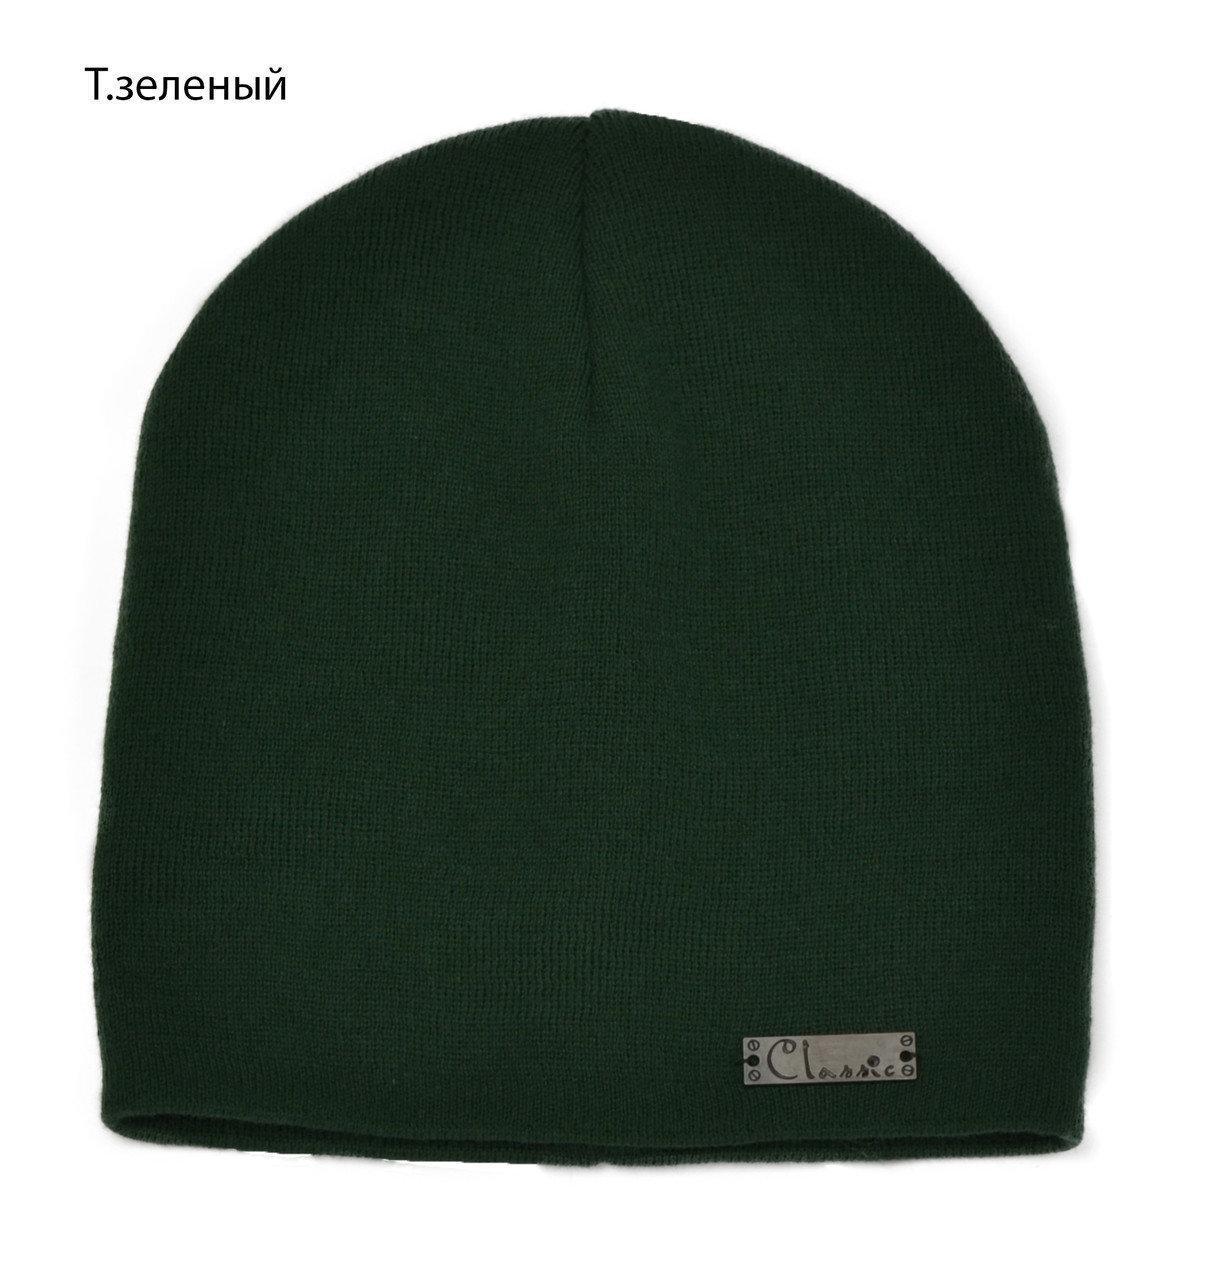 022 Арктик классик шапка. Двойная х/б 60%. Унисекс. р52-56 т.зеленый, т.серый, т.синий, электрик